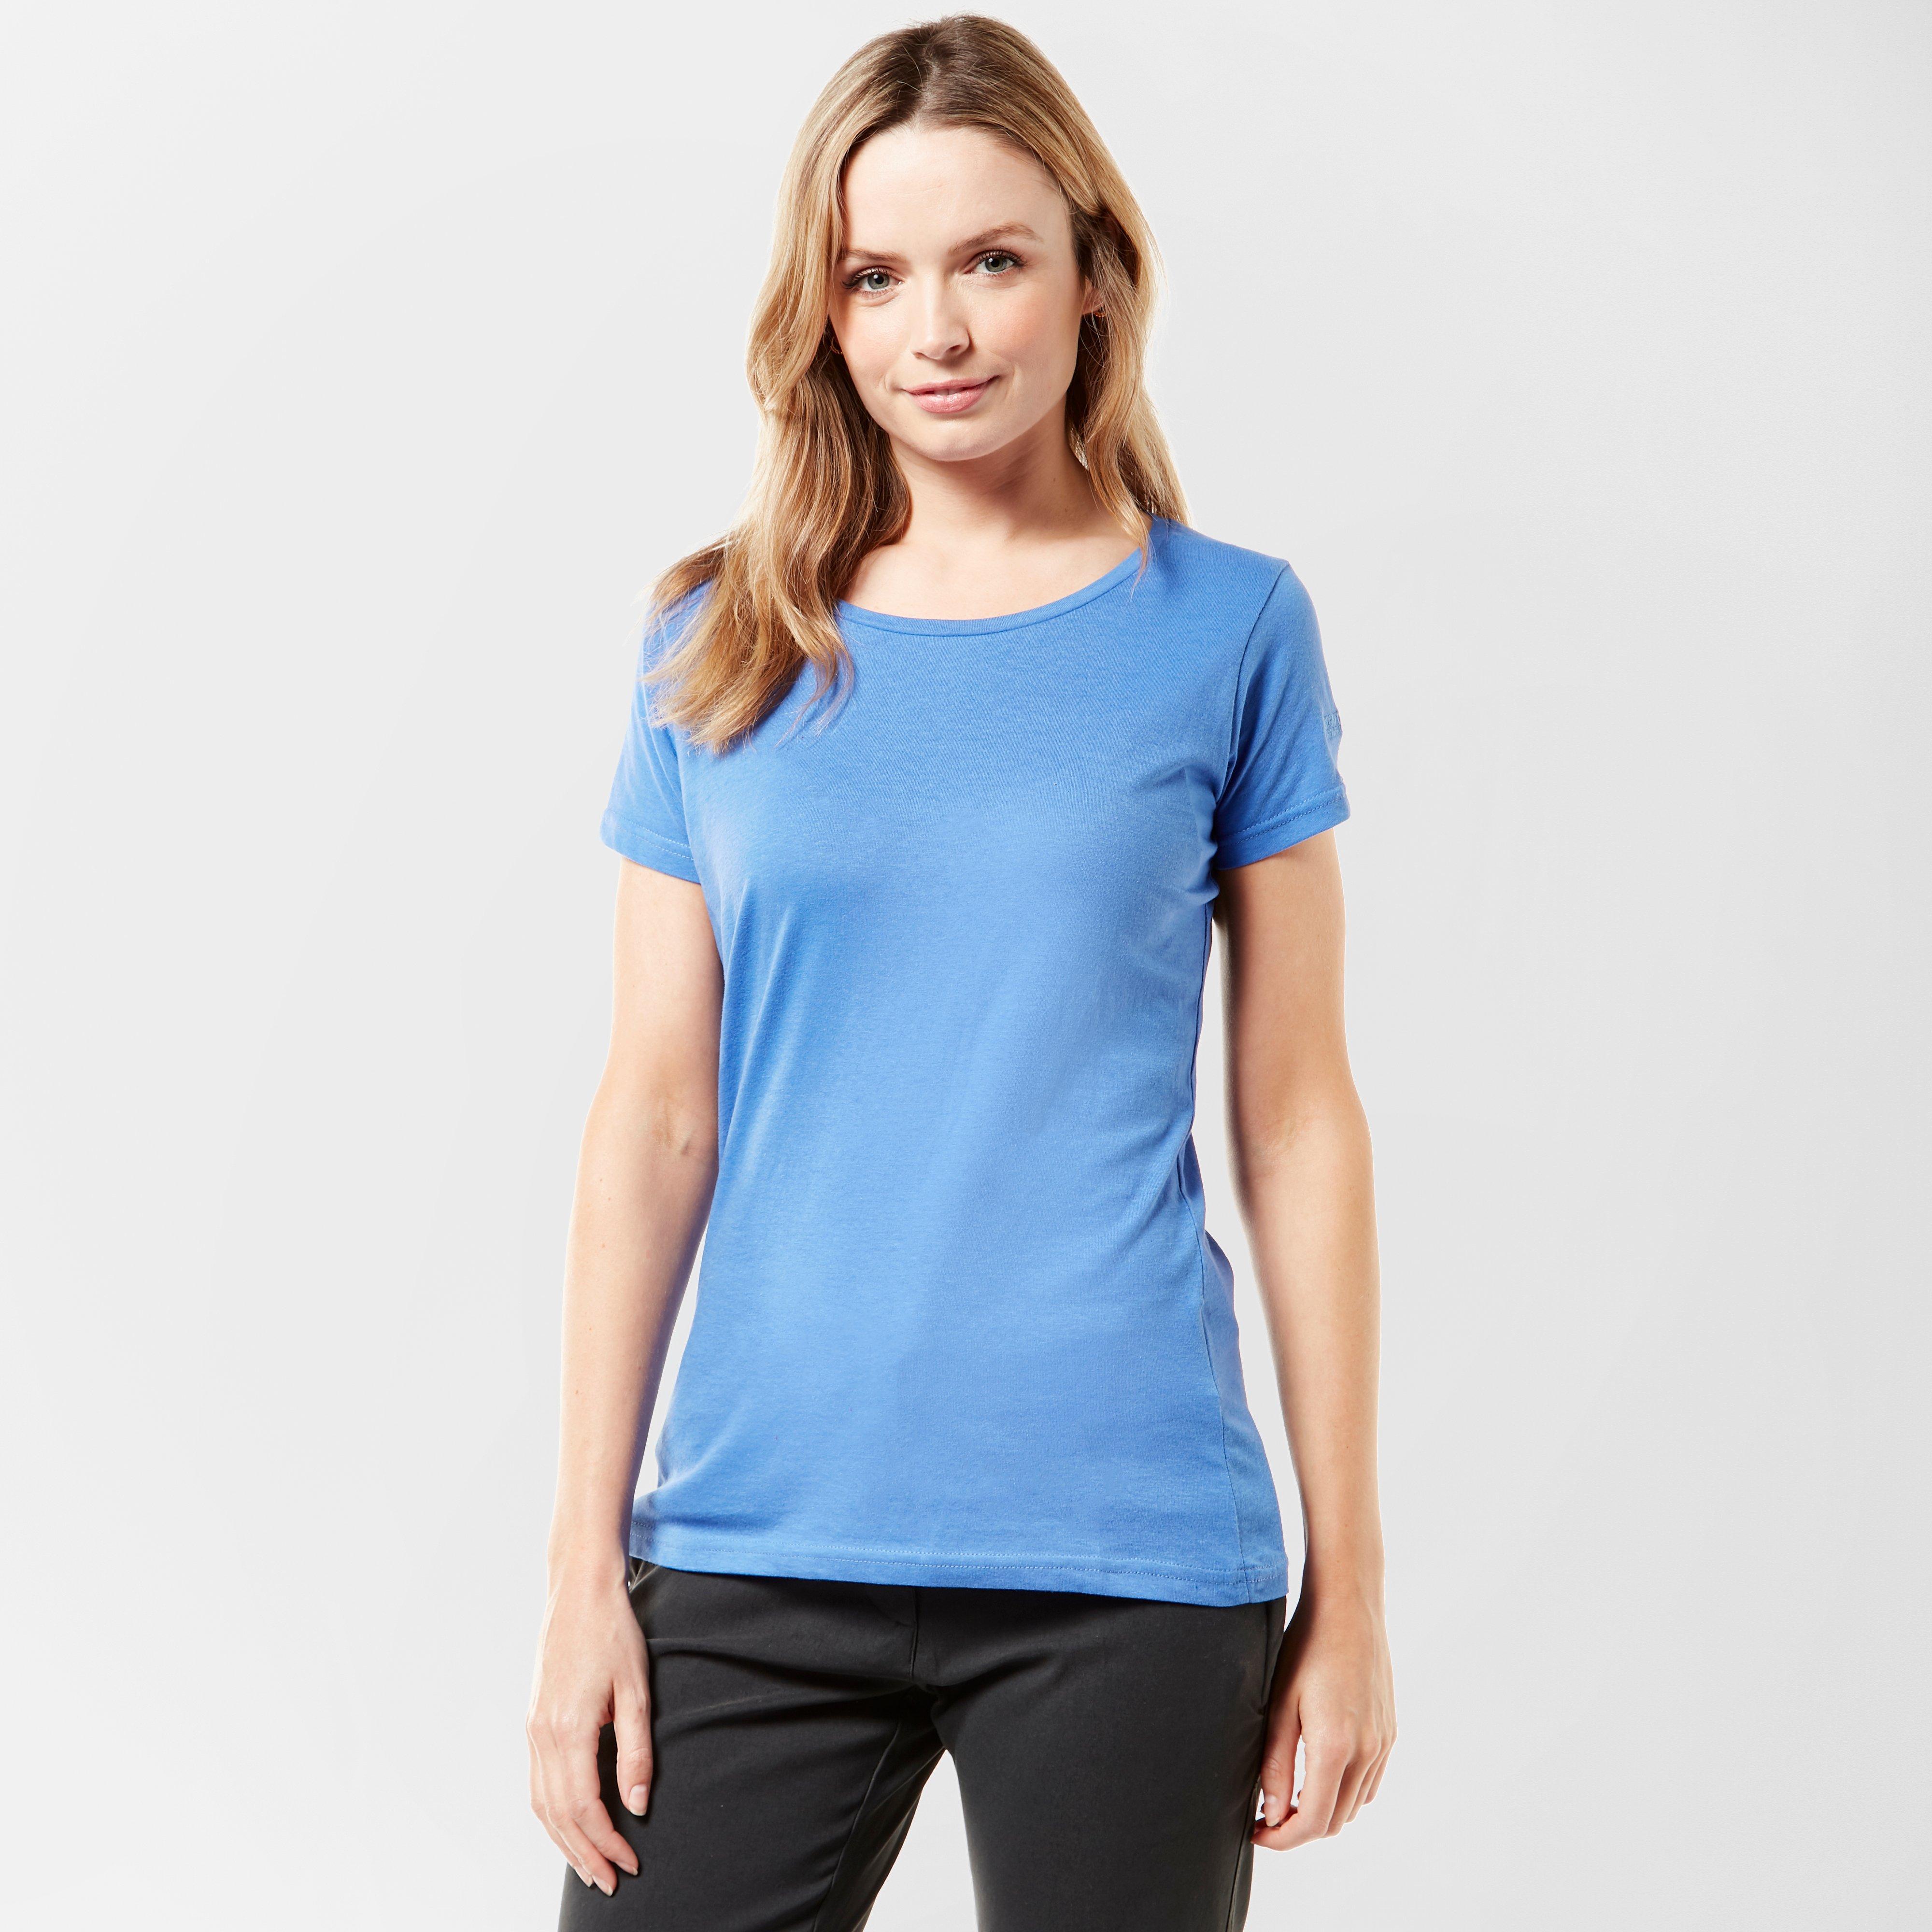 Regatta Regatta Womens Plain T-Shirt - Blue, Blue